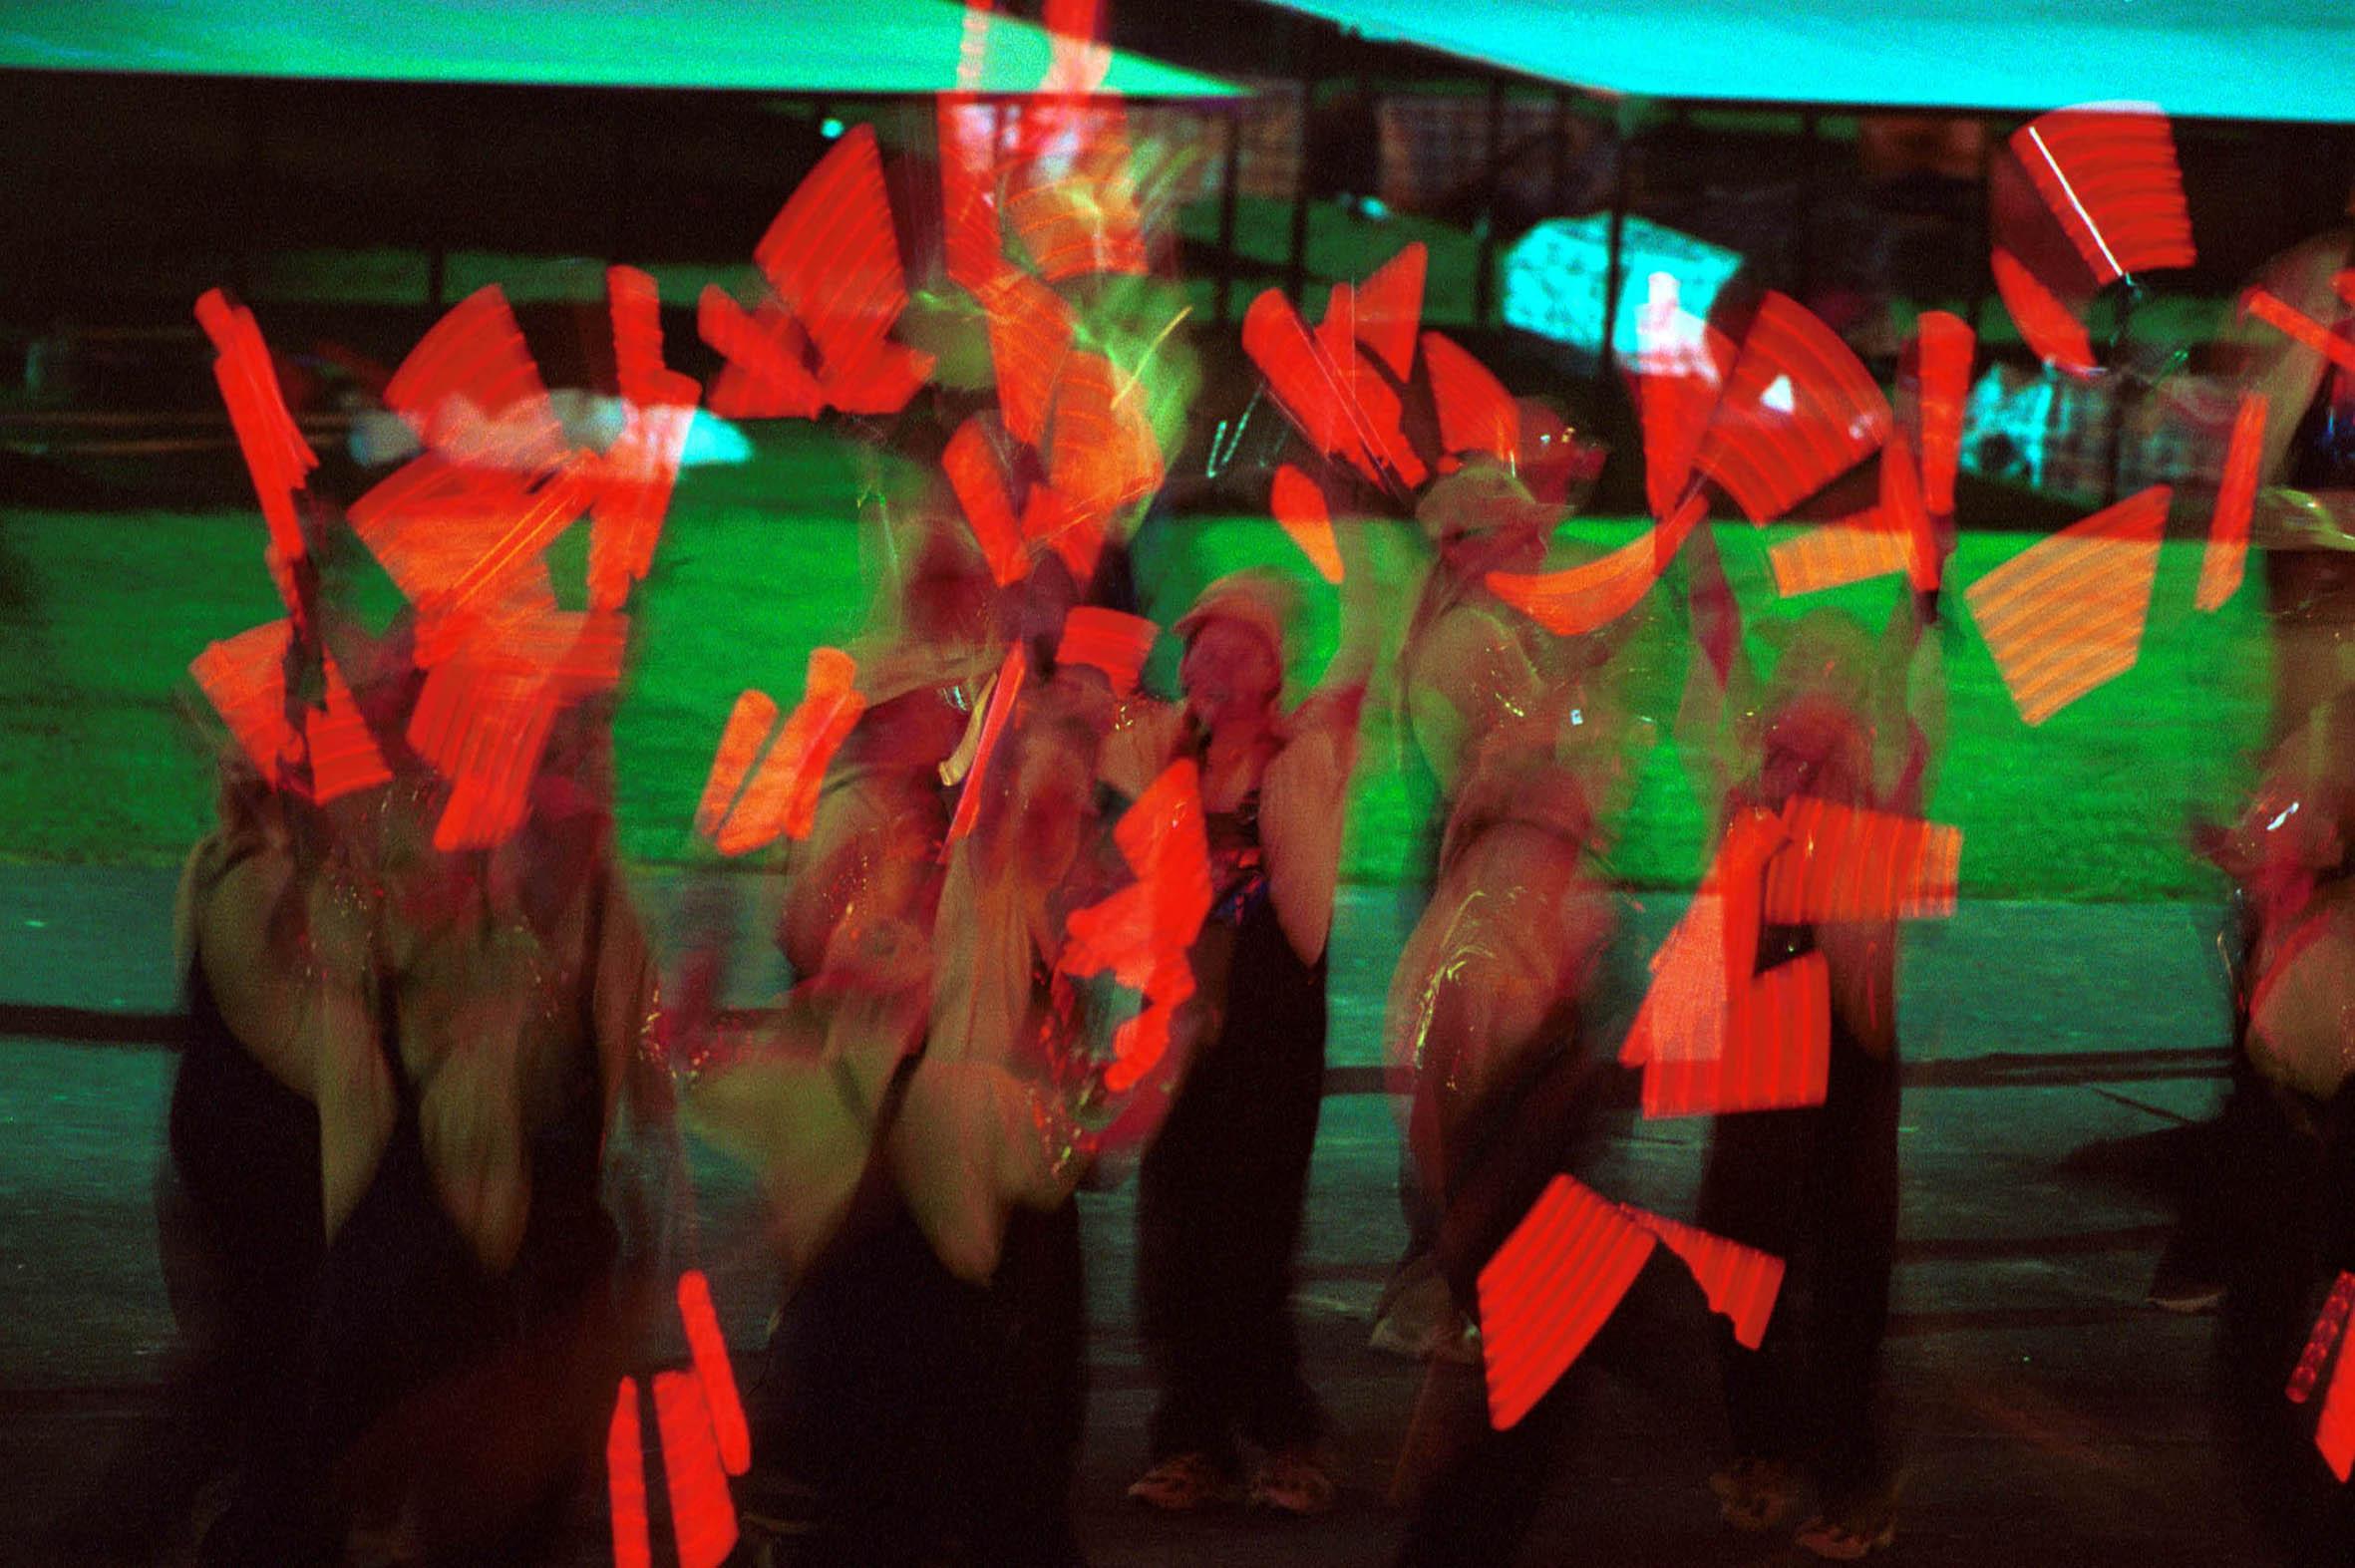 _-_Opening_Ceremony_kids_lights_perform_-_3b_-_2000_Sydney_opening ...